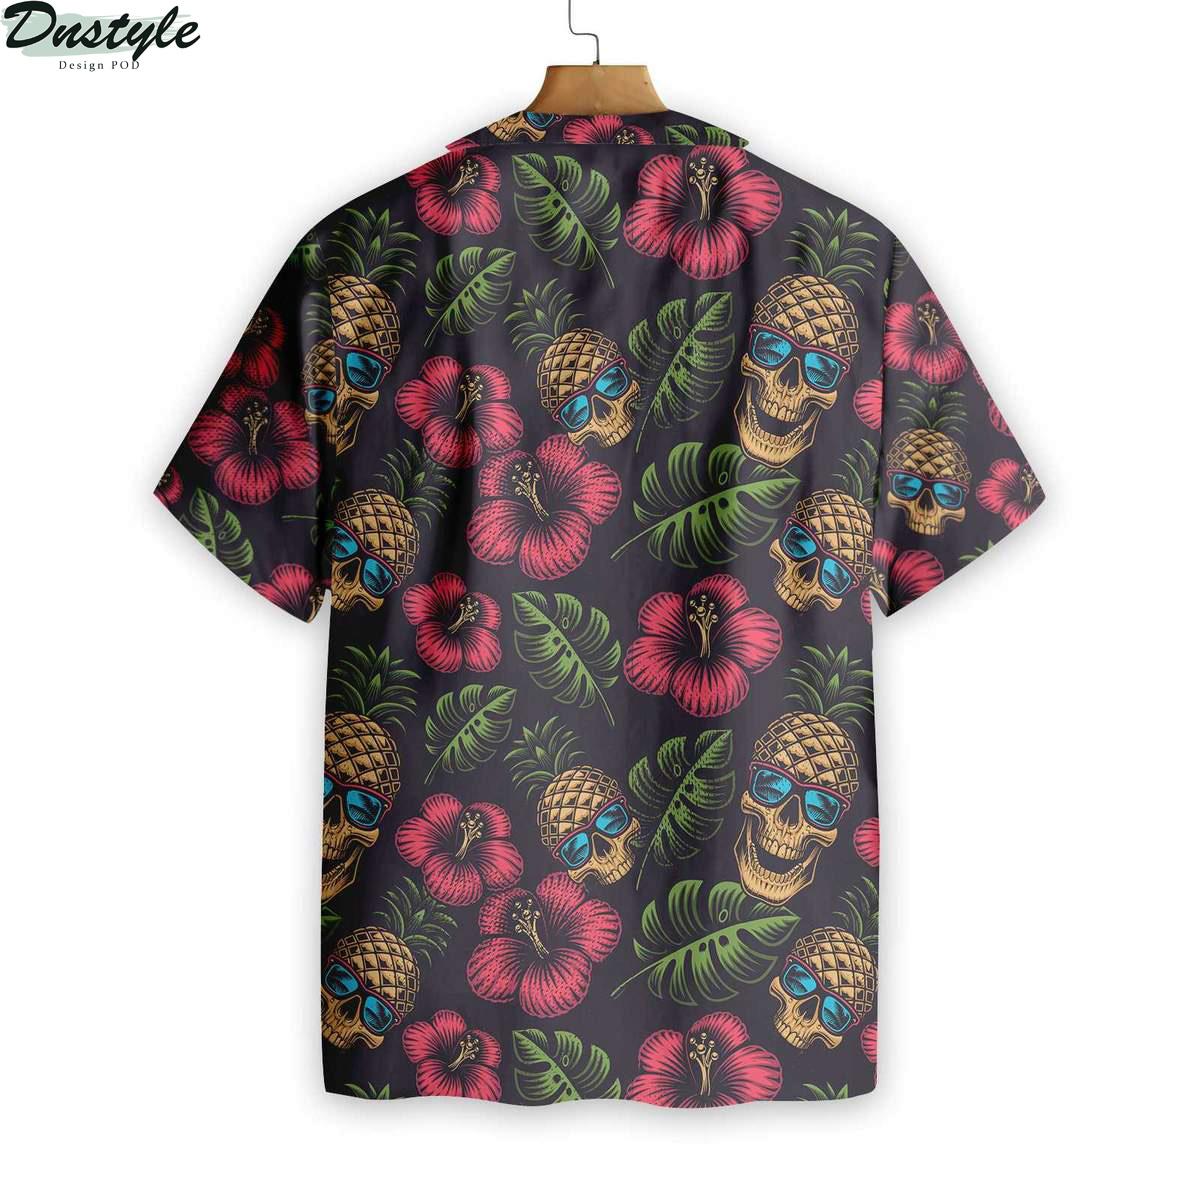 Pineapple Skull Black Hawaiian Shirt 2